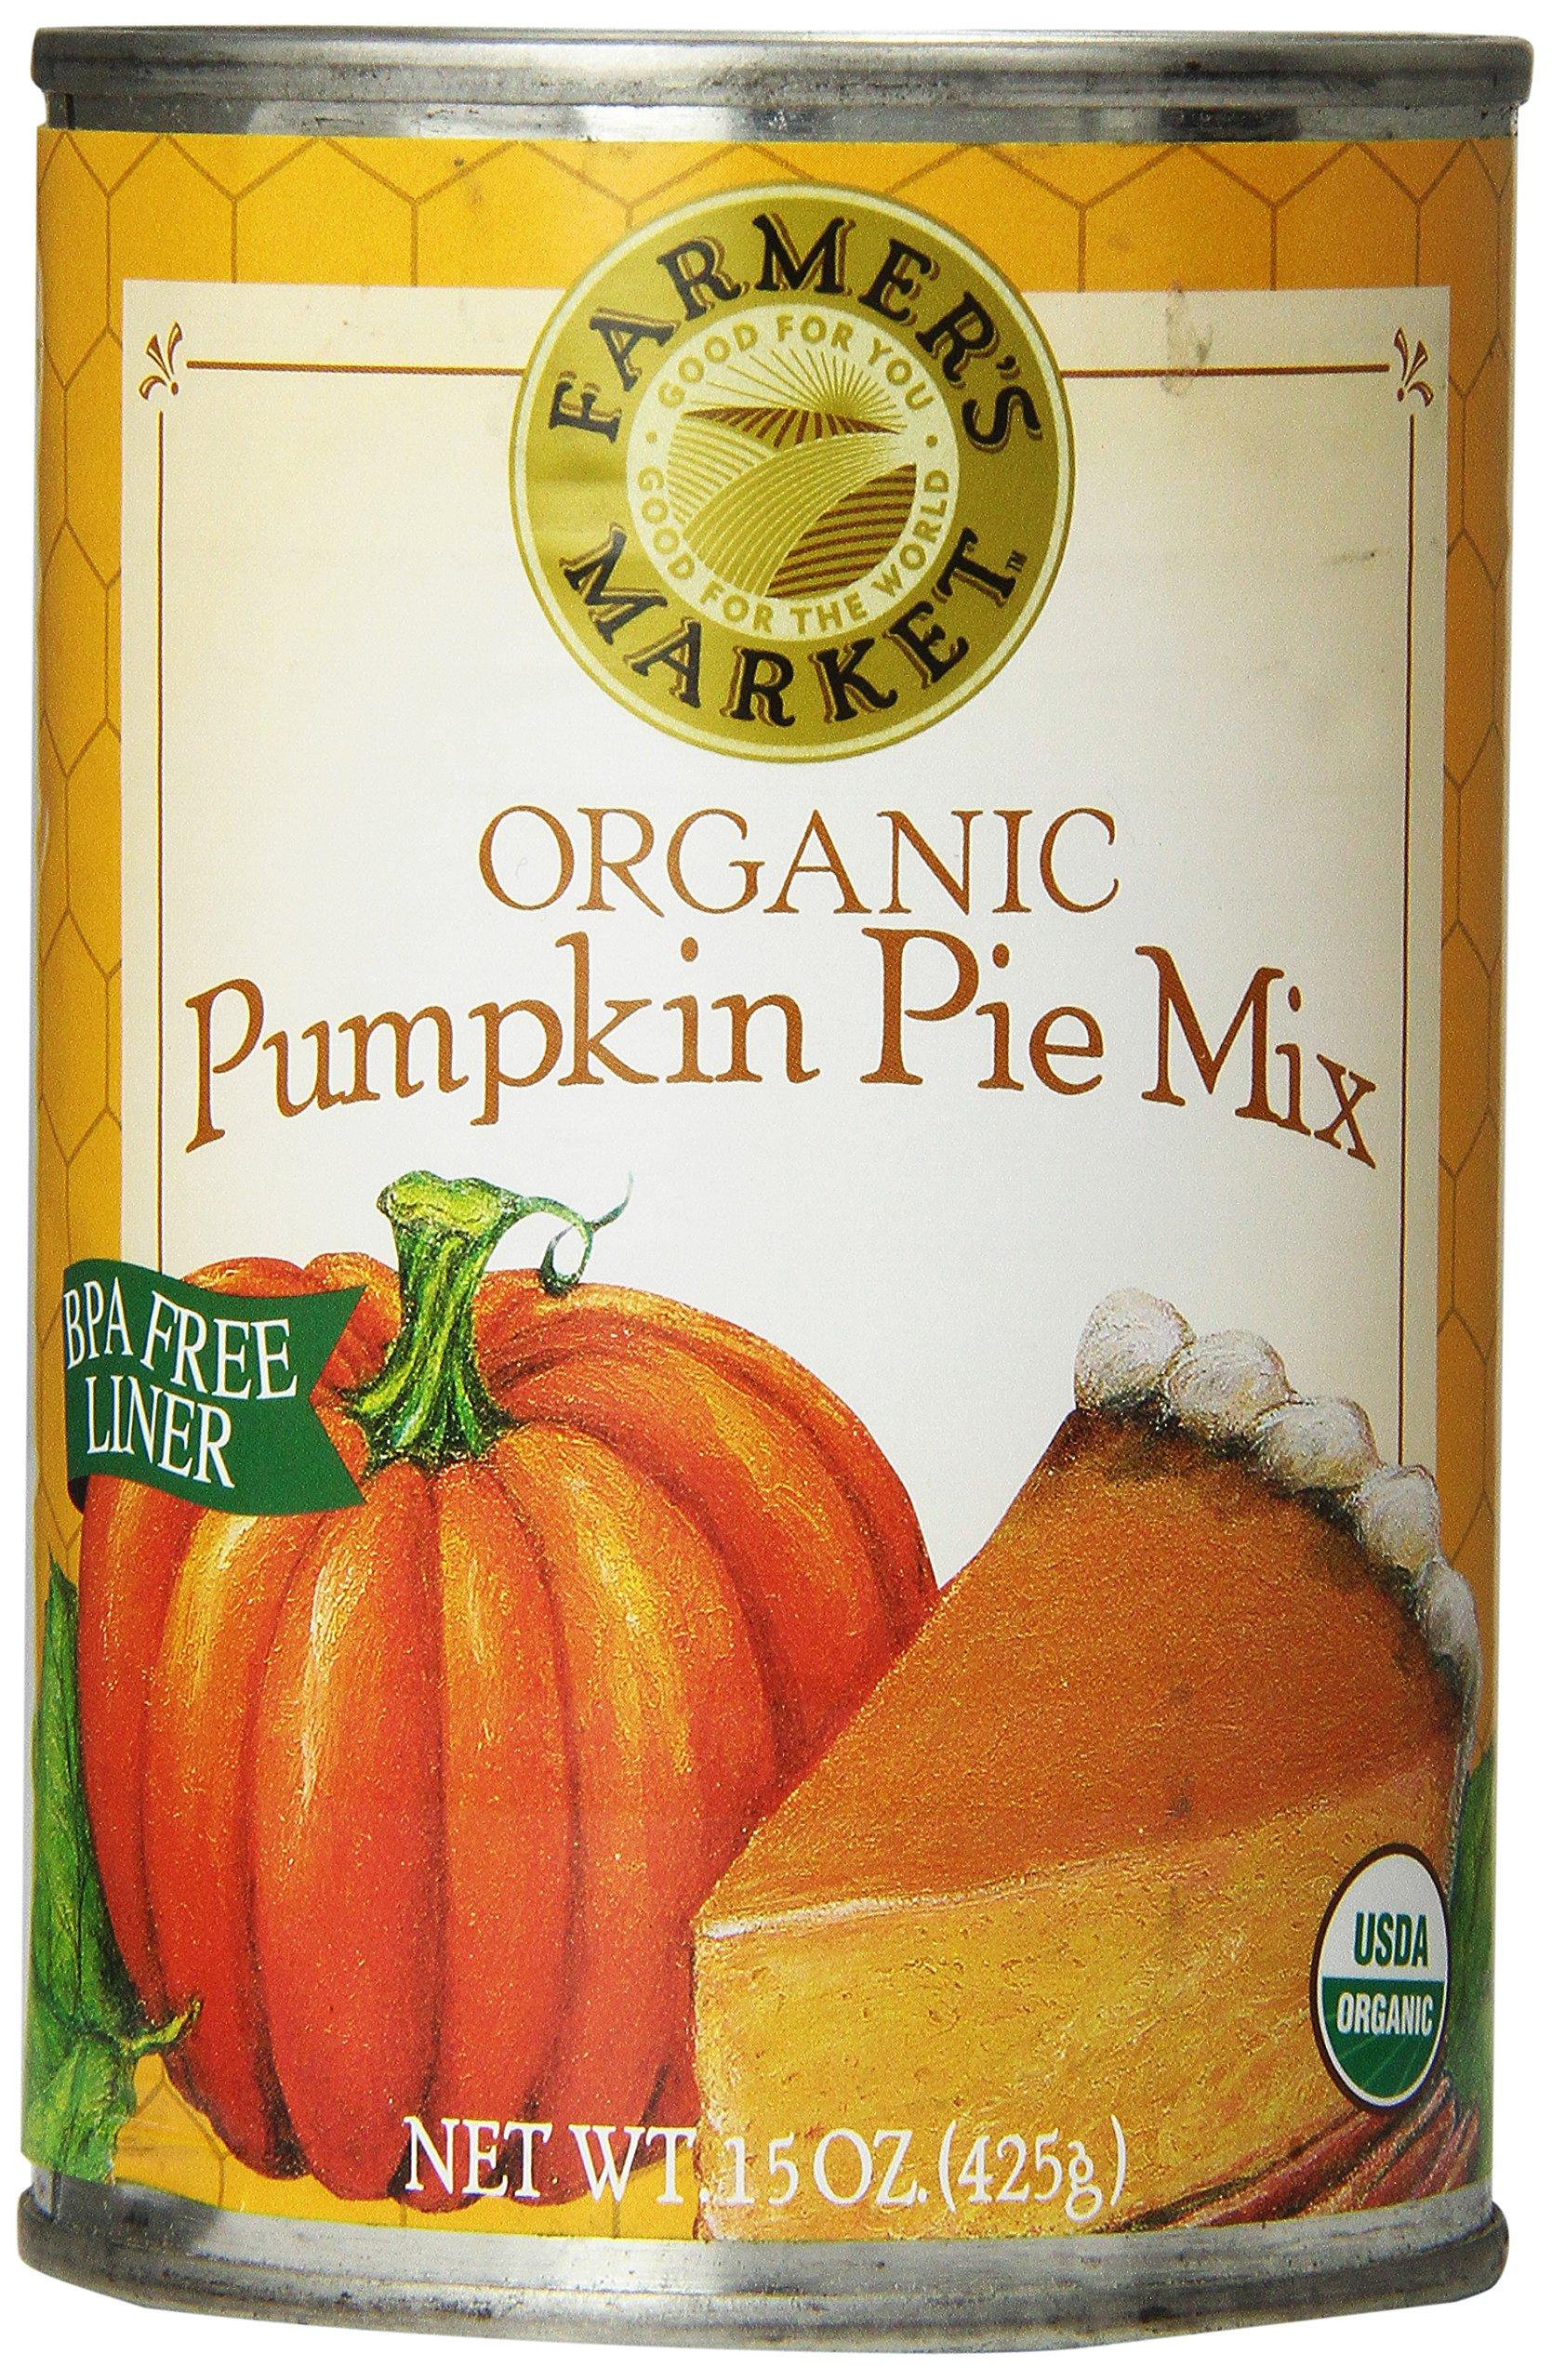 Farmer's Market Foods, Organic Canned Pumpkin Pie Mix, 15 oz